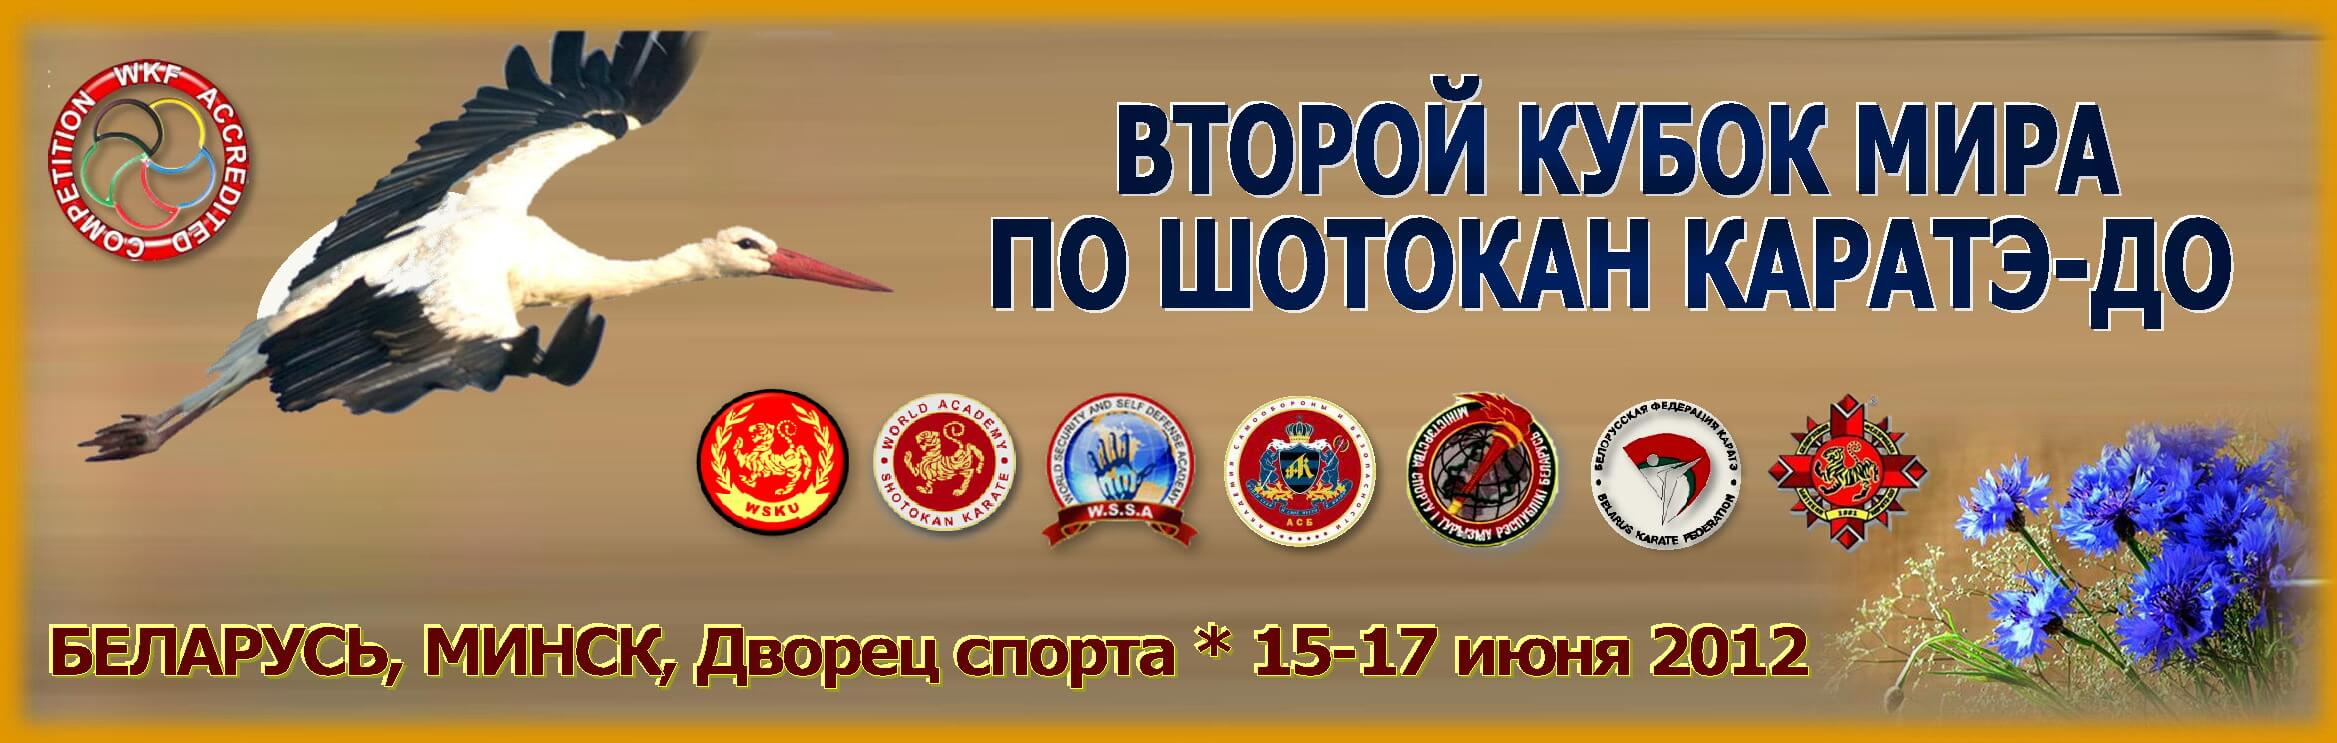 00 Минск 2012 Баннер rus''